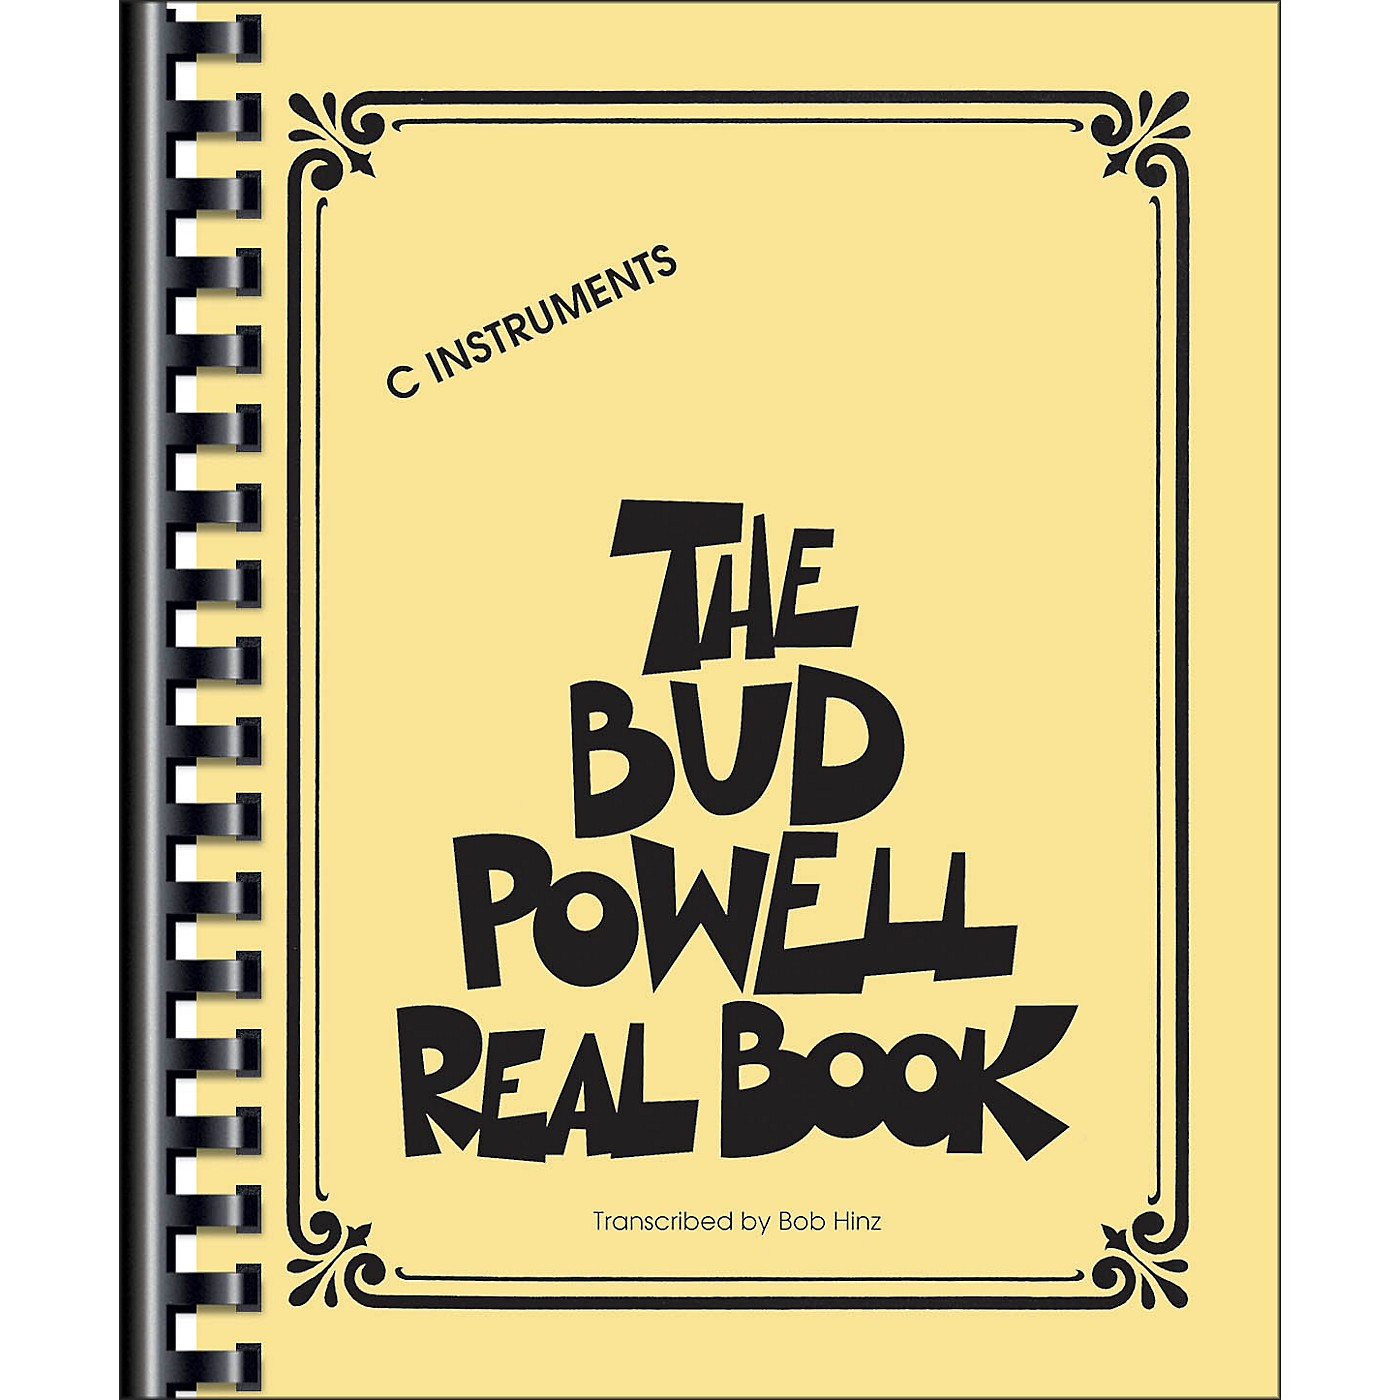 Hal Leonard Bud Powell Real Book thumbnail